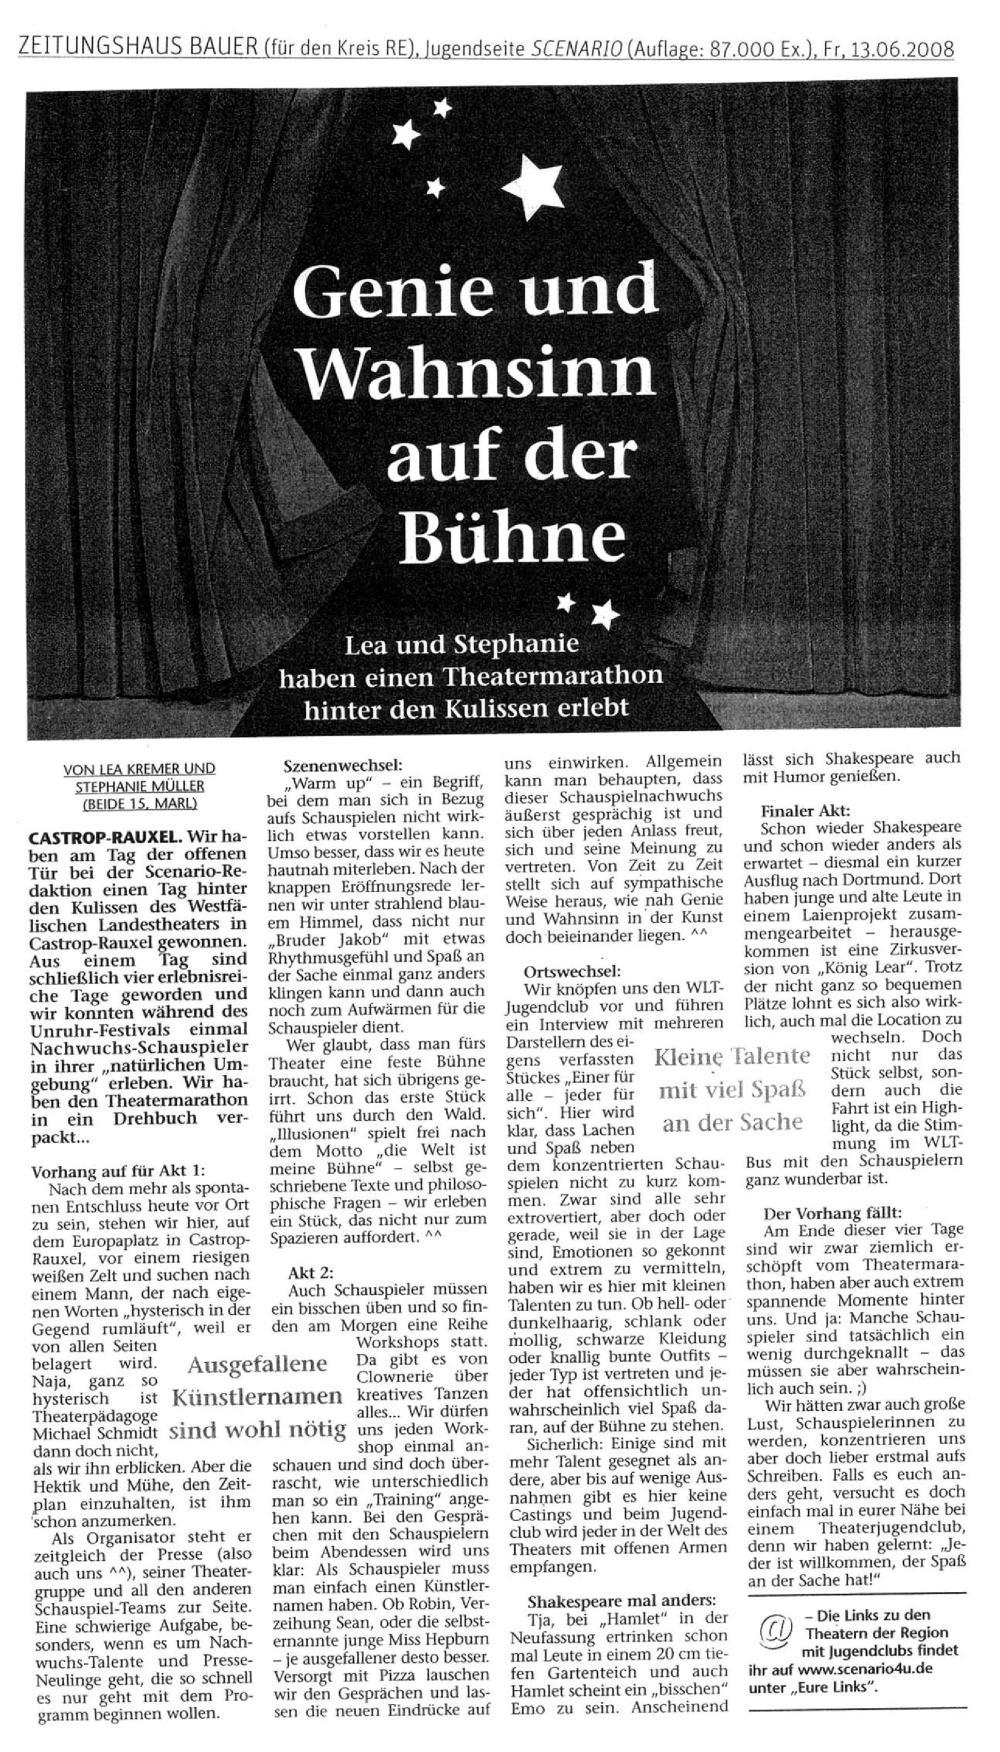 2008-06-unruhr-bericht-in-scenario-page-001